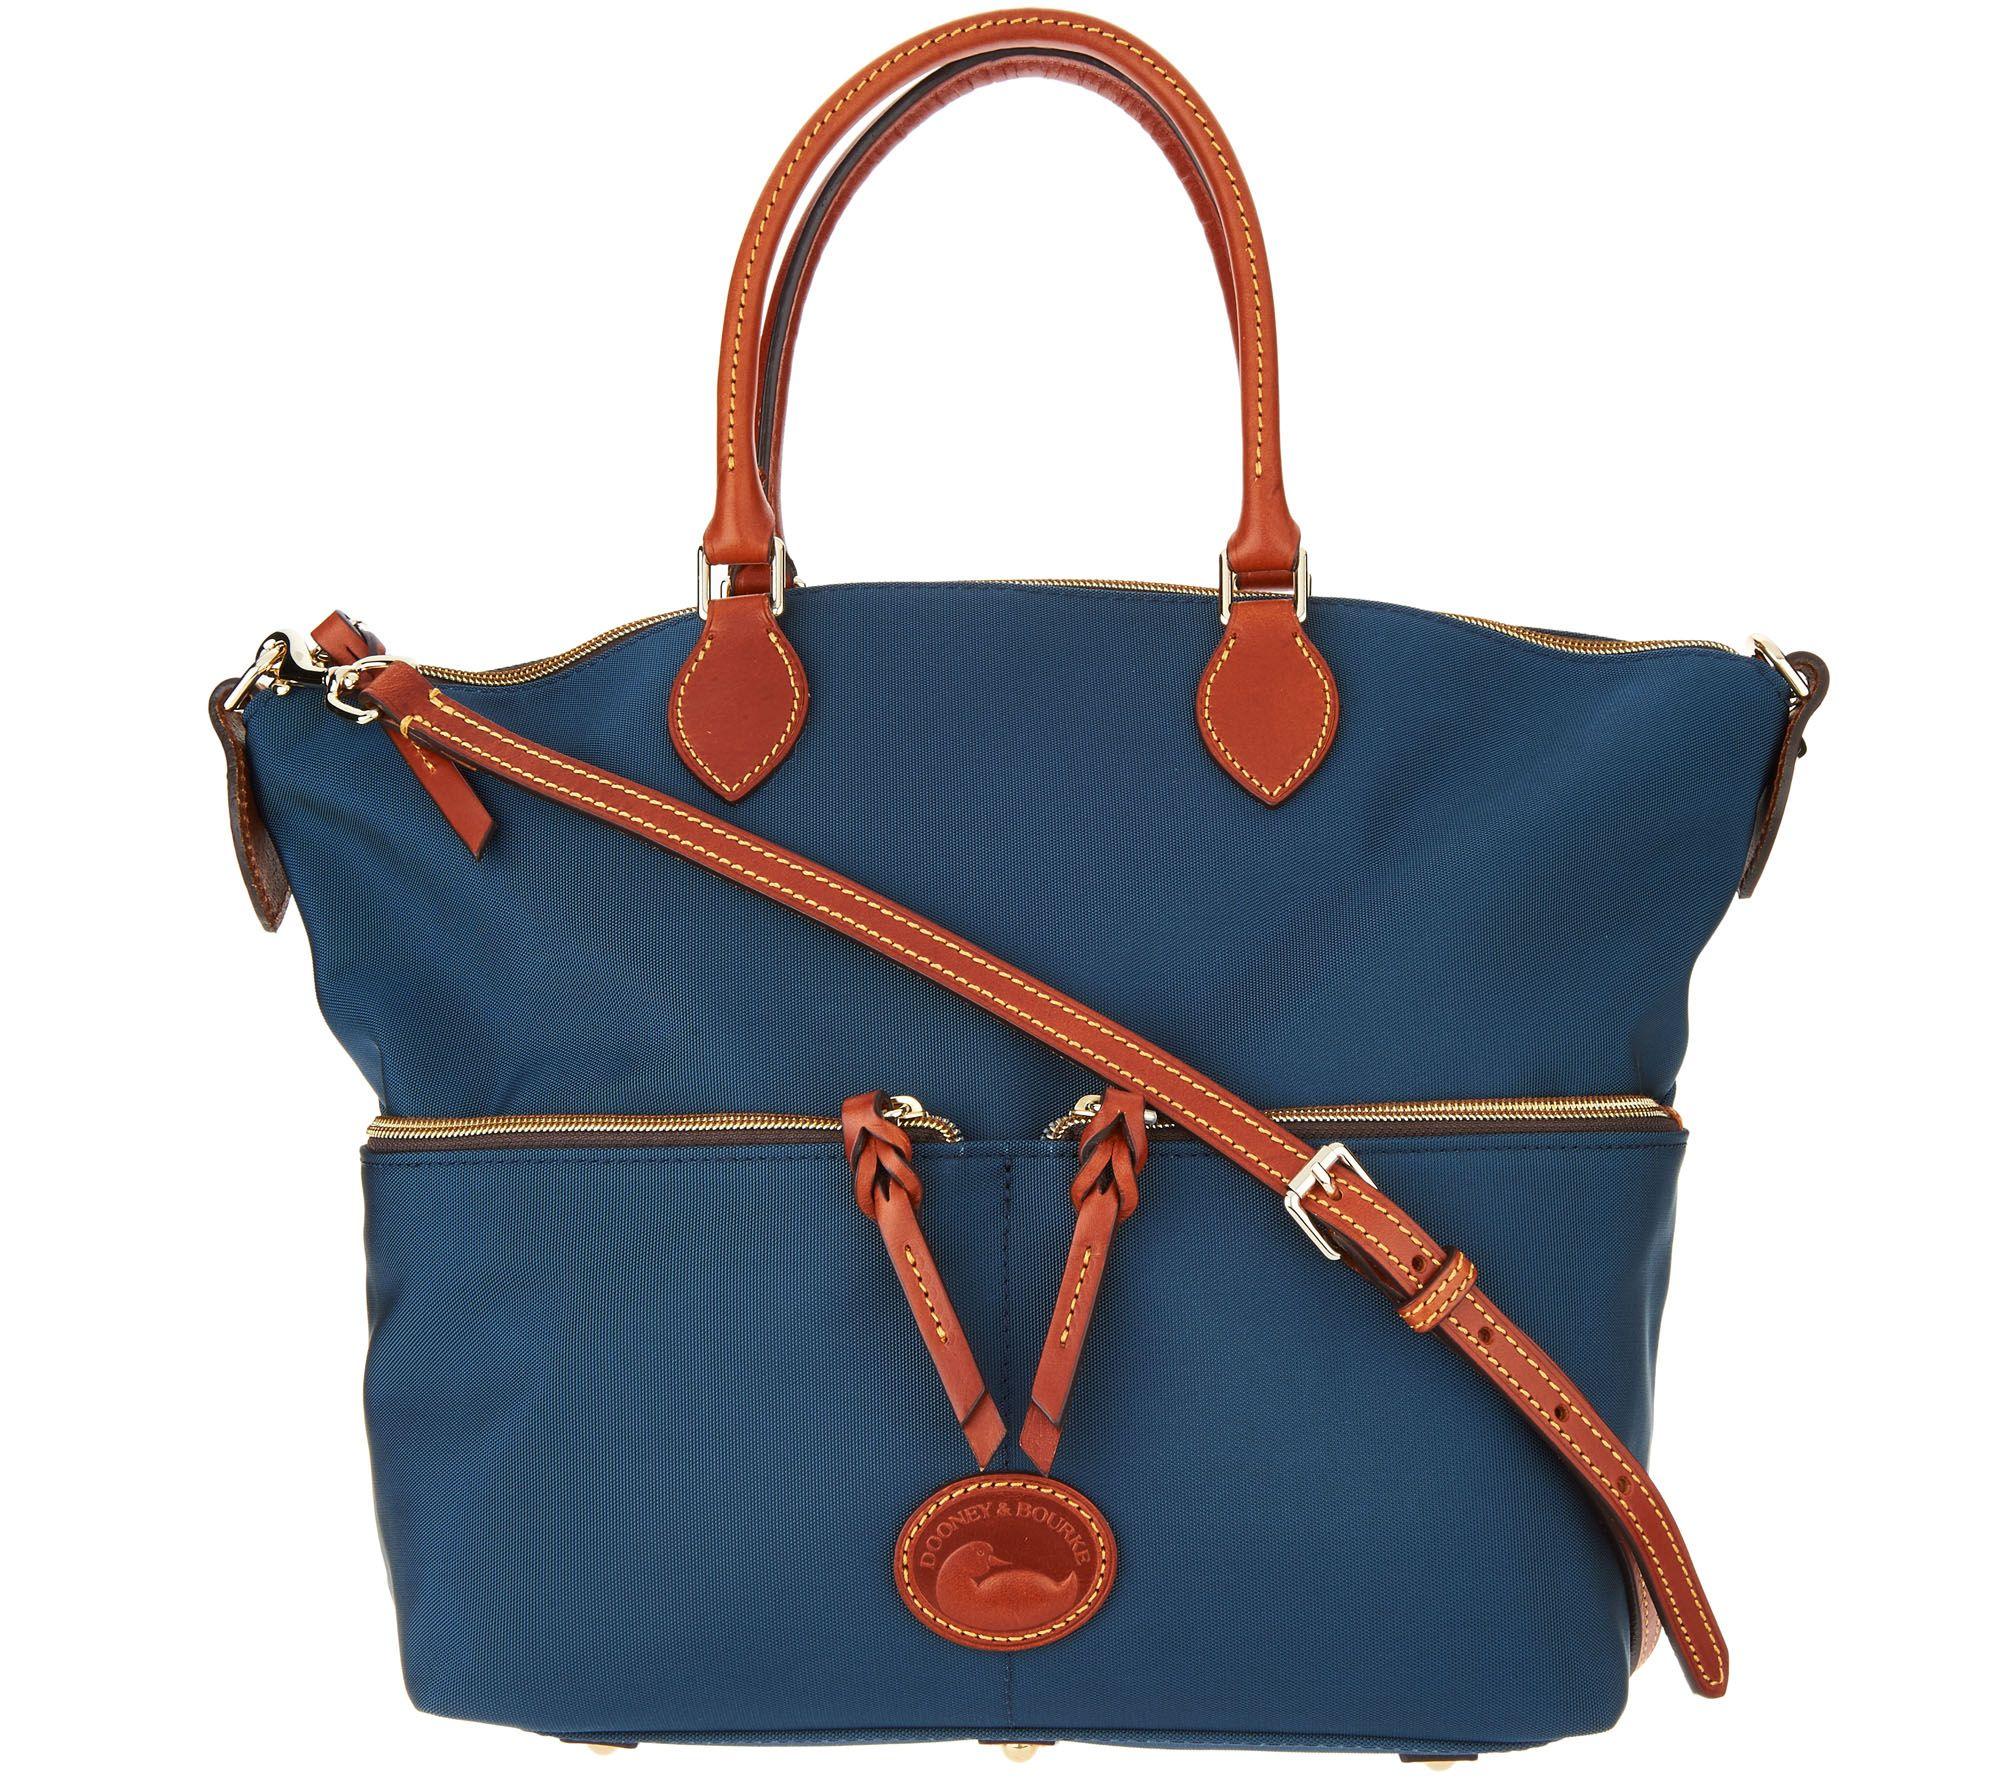 Dooney & Bourke Nylon Large Pocket Satchel Handbag — QVC.com